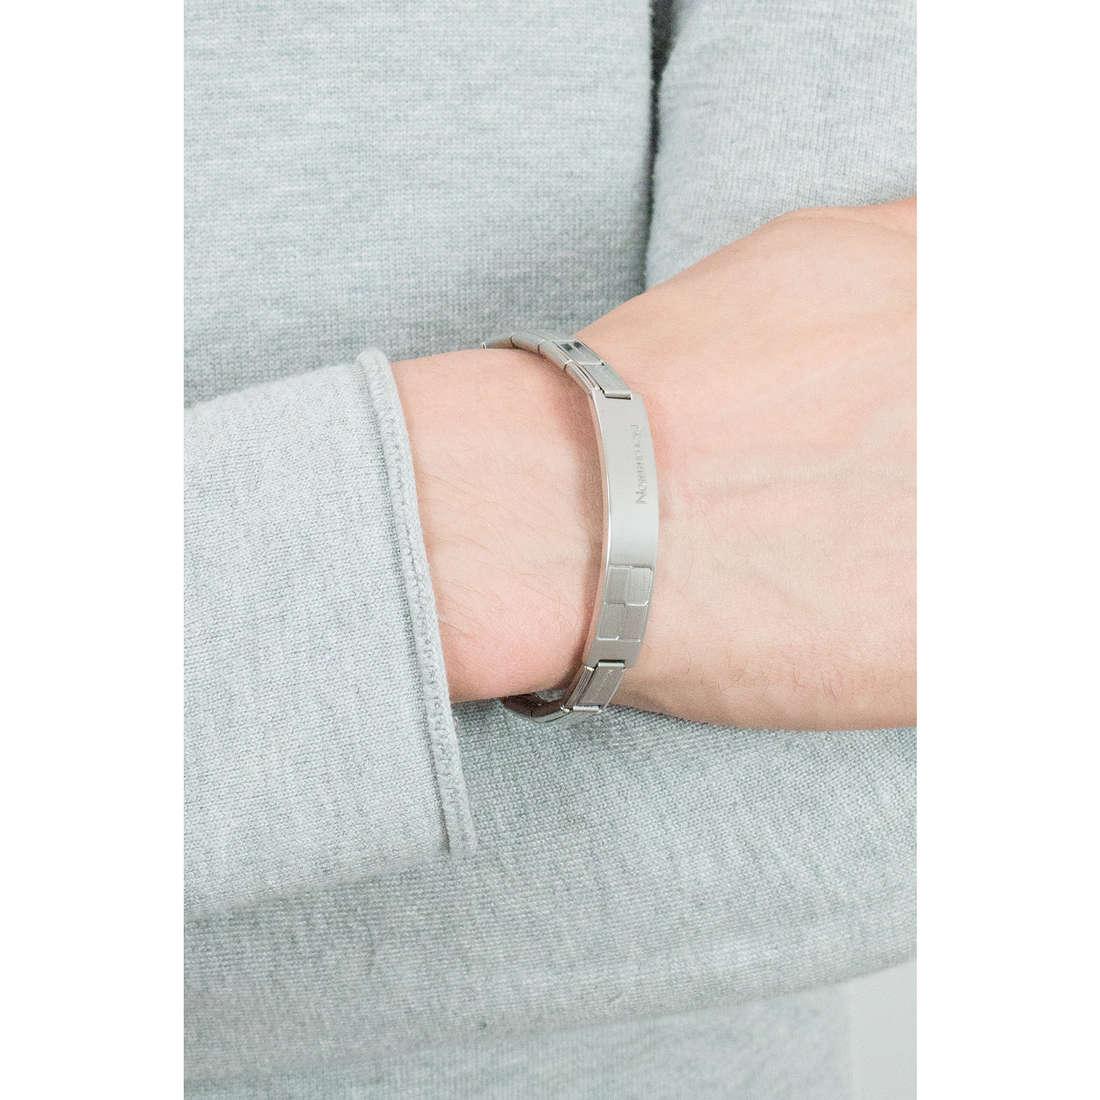 Nomination bracciali Trendsetter uomo 021108/006/004 indosso